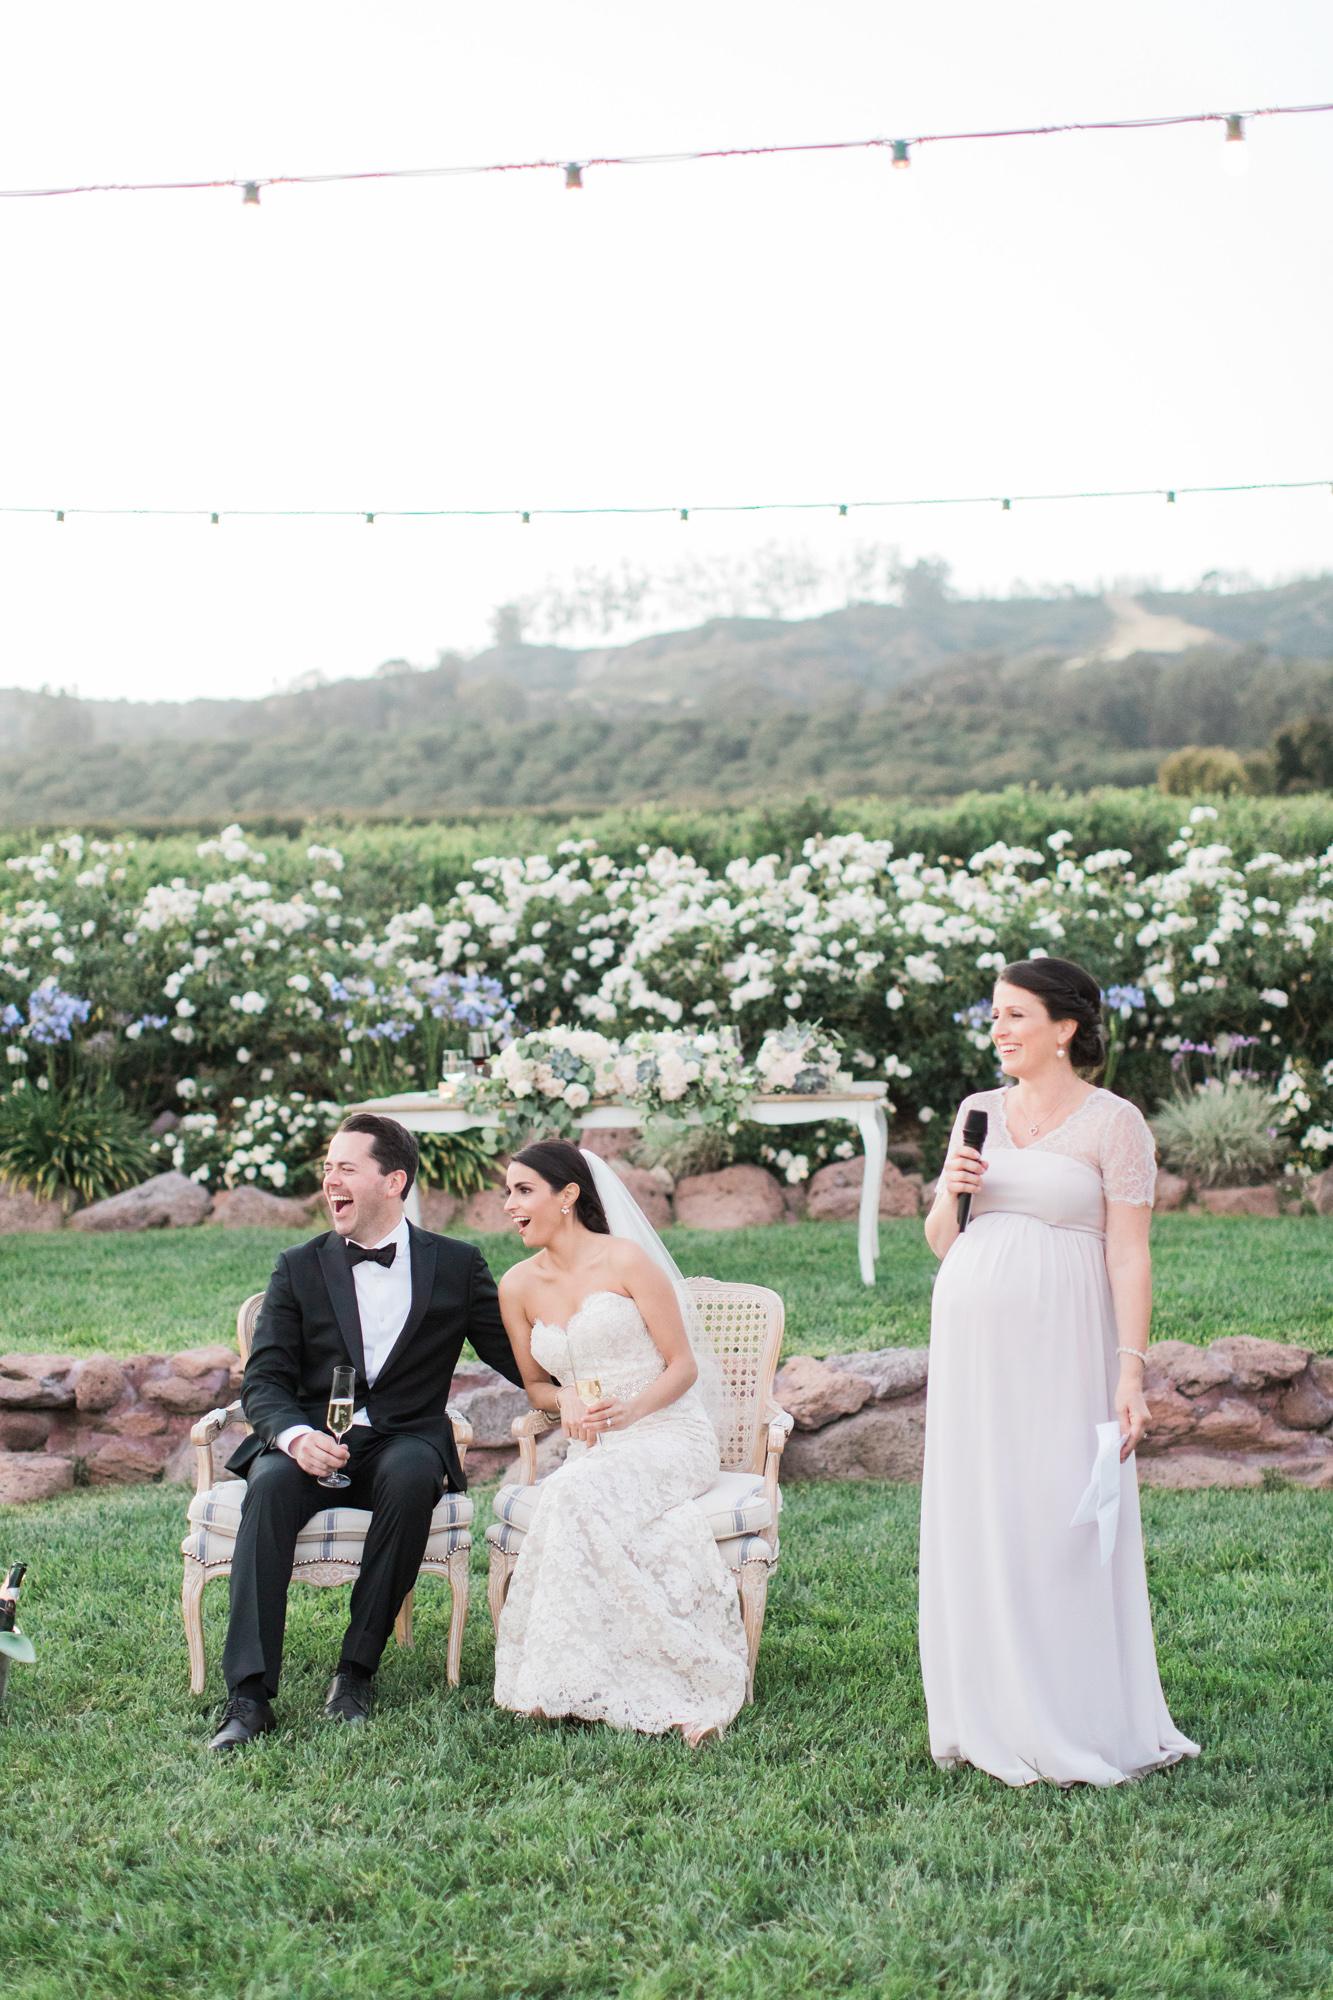 Gerry-Ranch-Wedding-Photography-Kristina-Adams-33.jpg